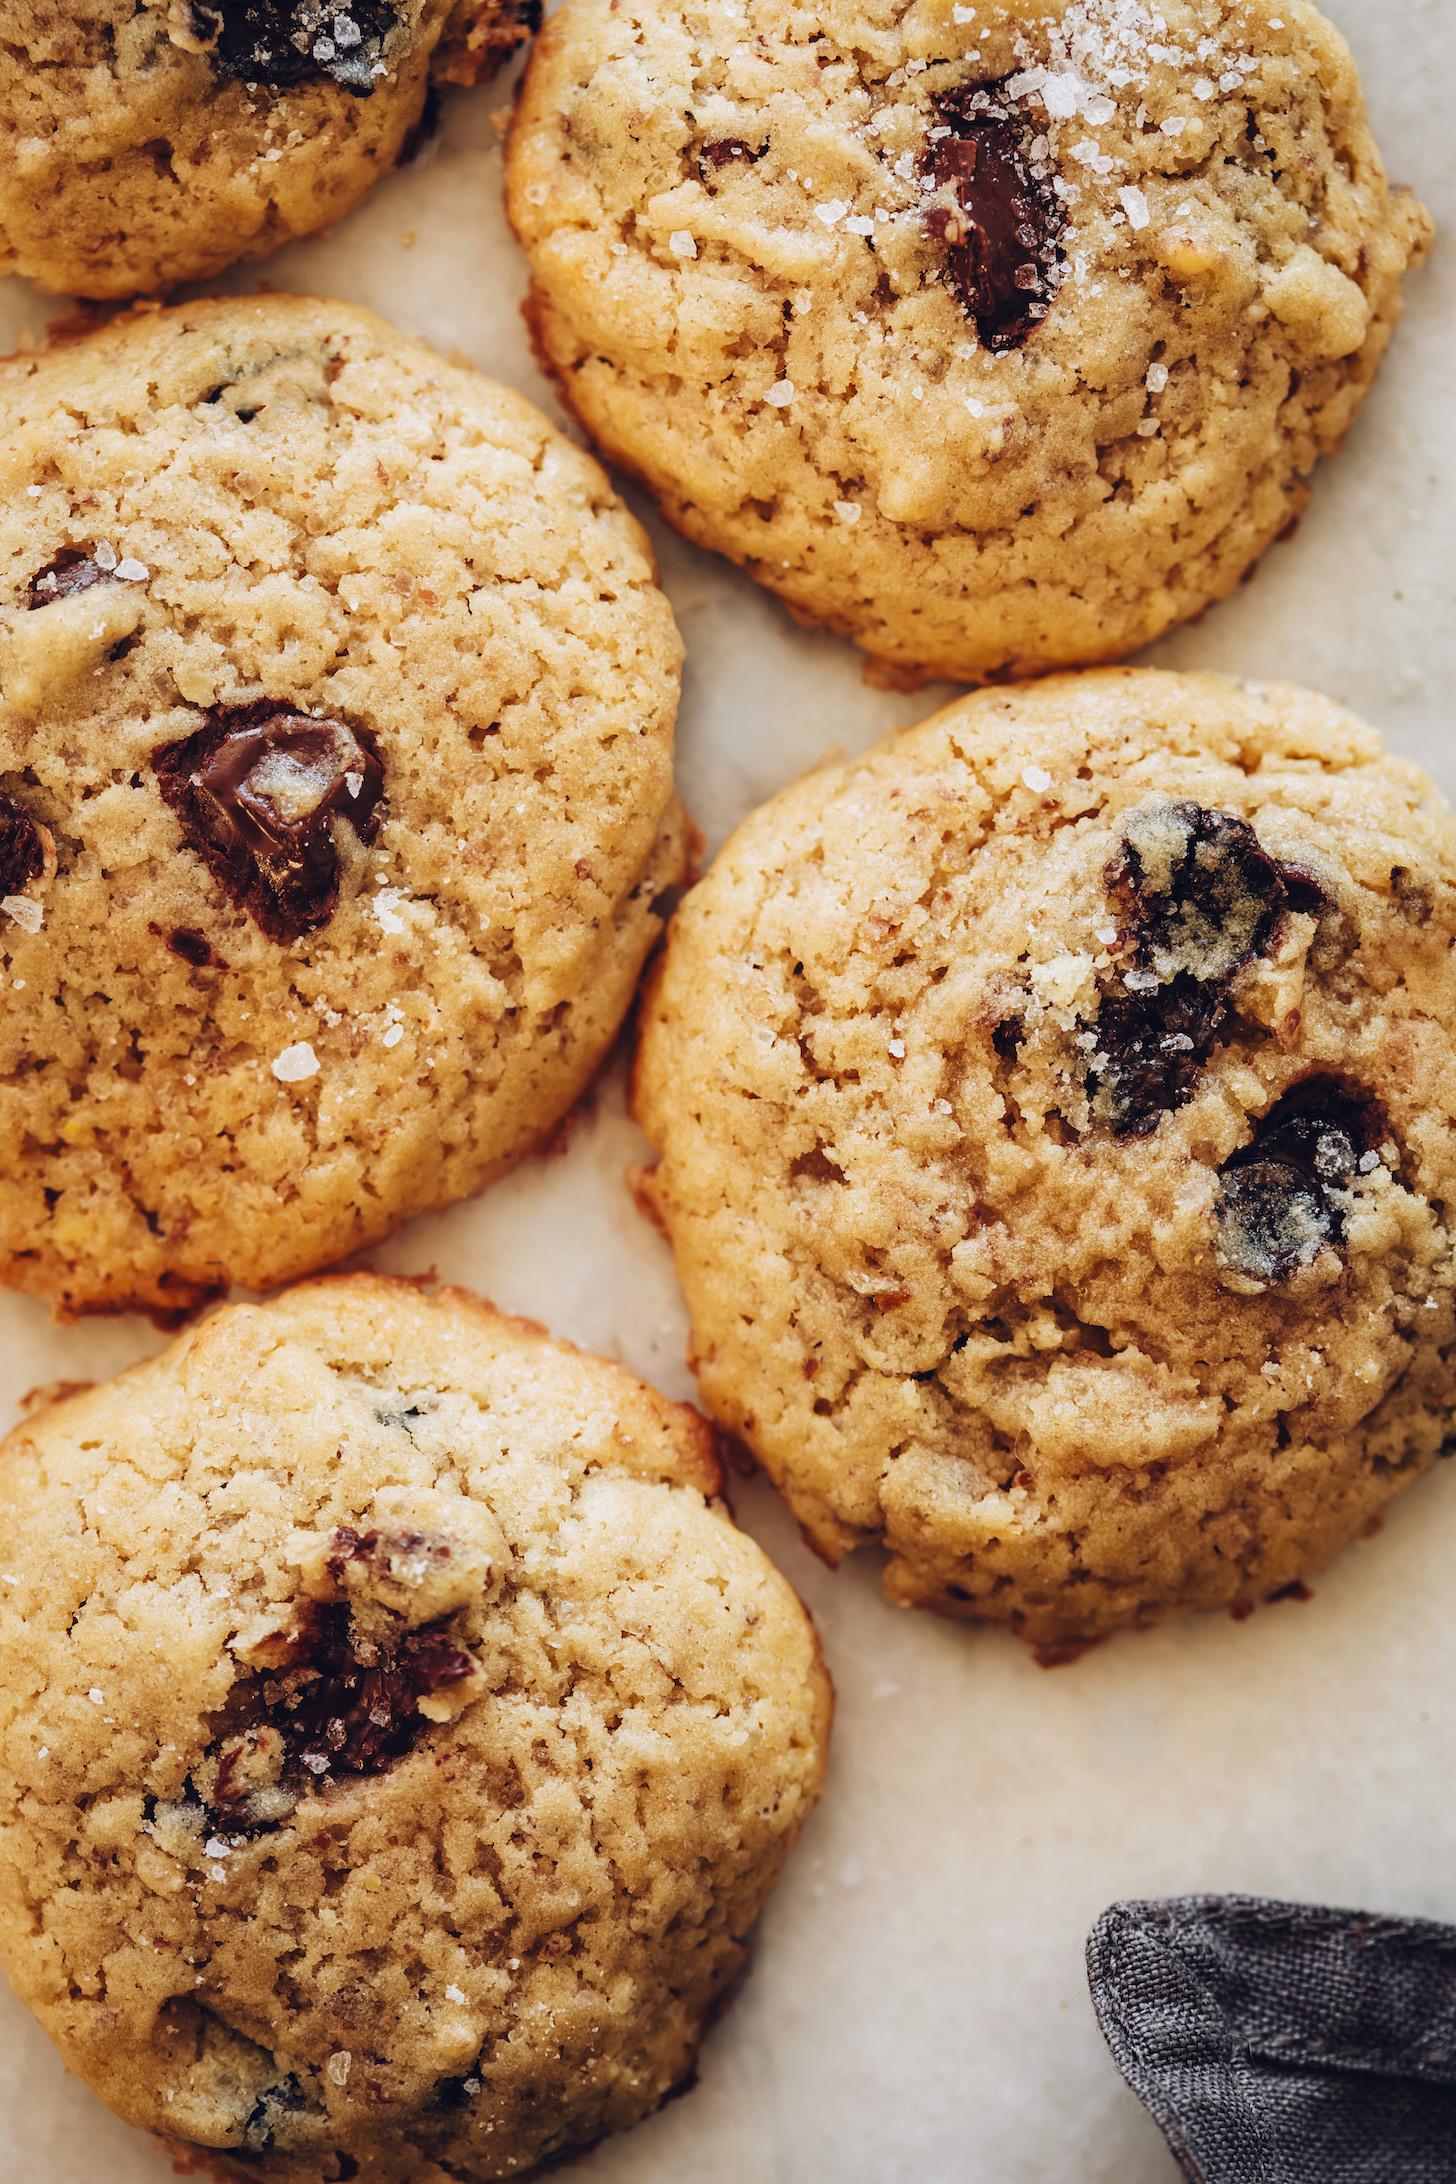 Classic vegan chocolate chip cookies sprinkled with sea salt